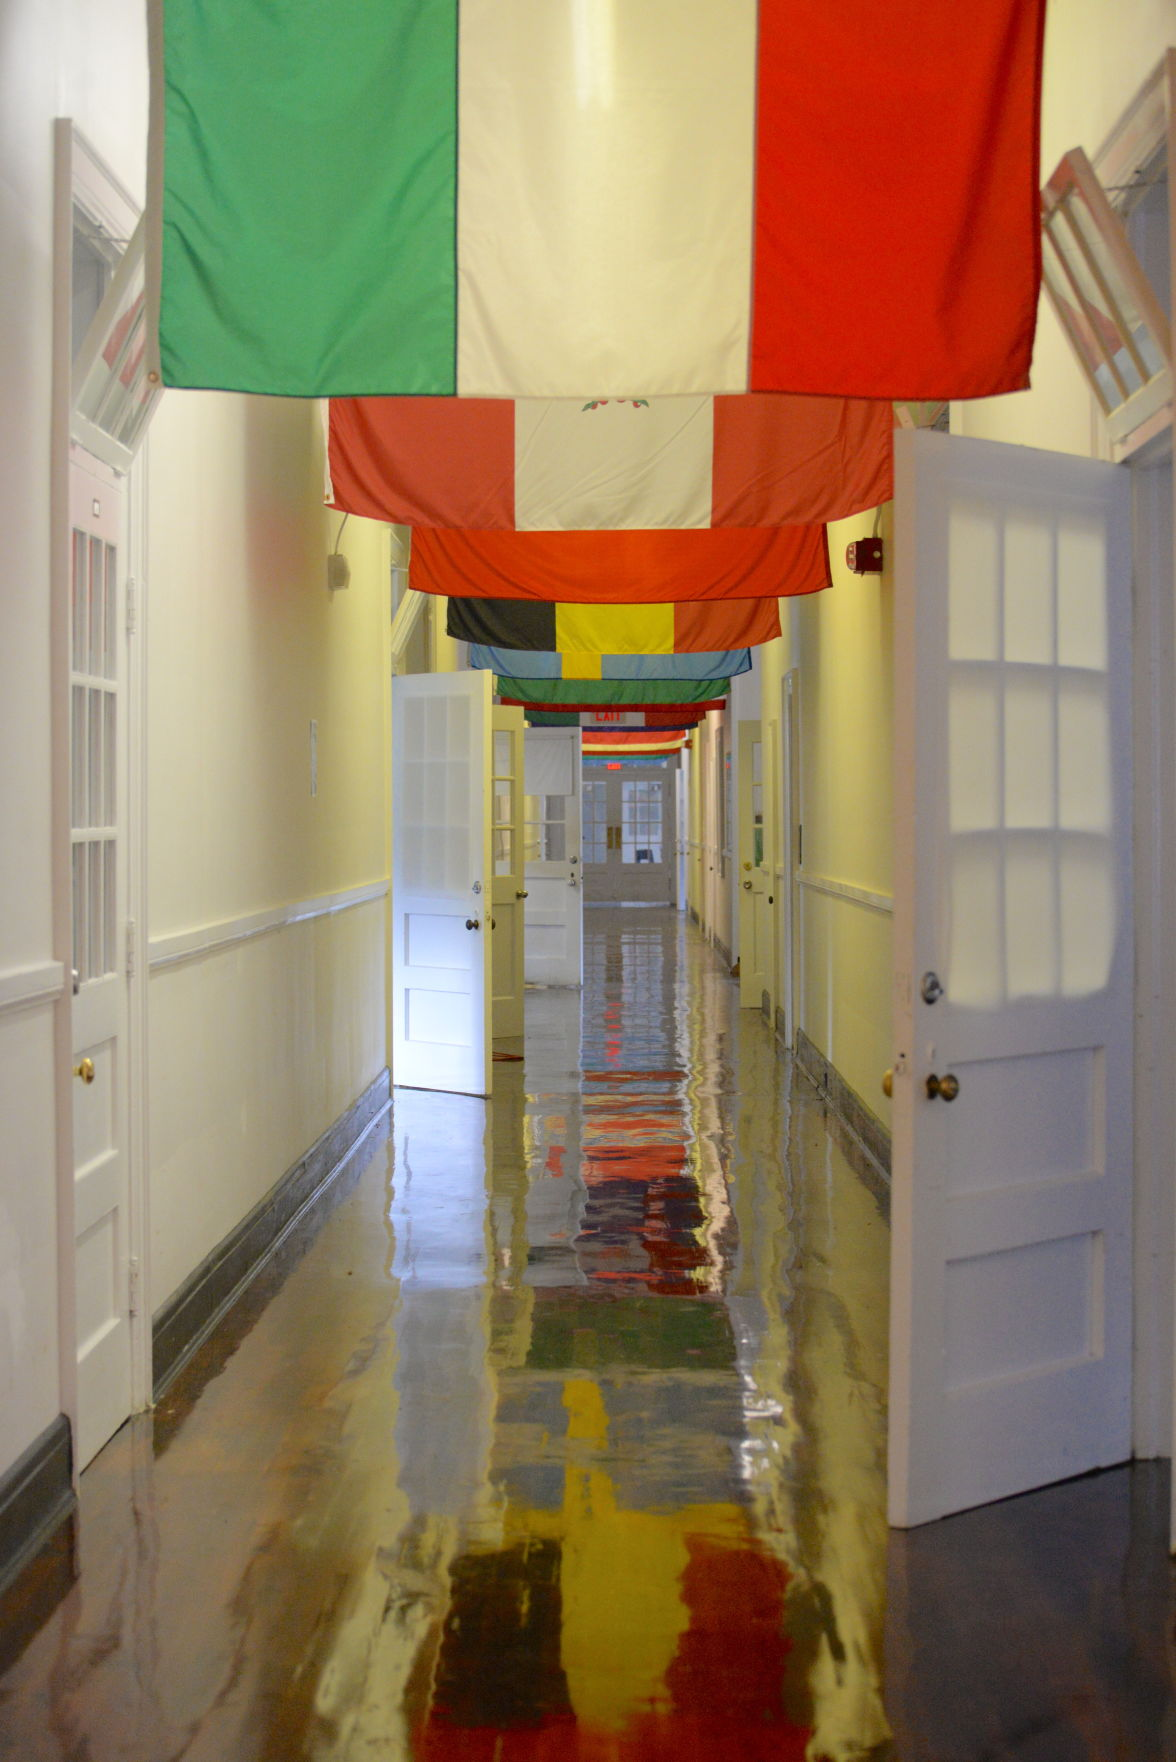 folkmoot hallway with flags 2.JPG